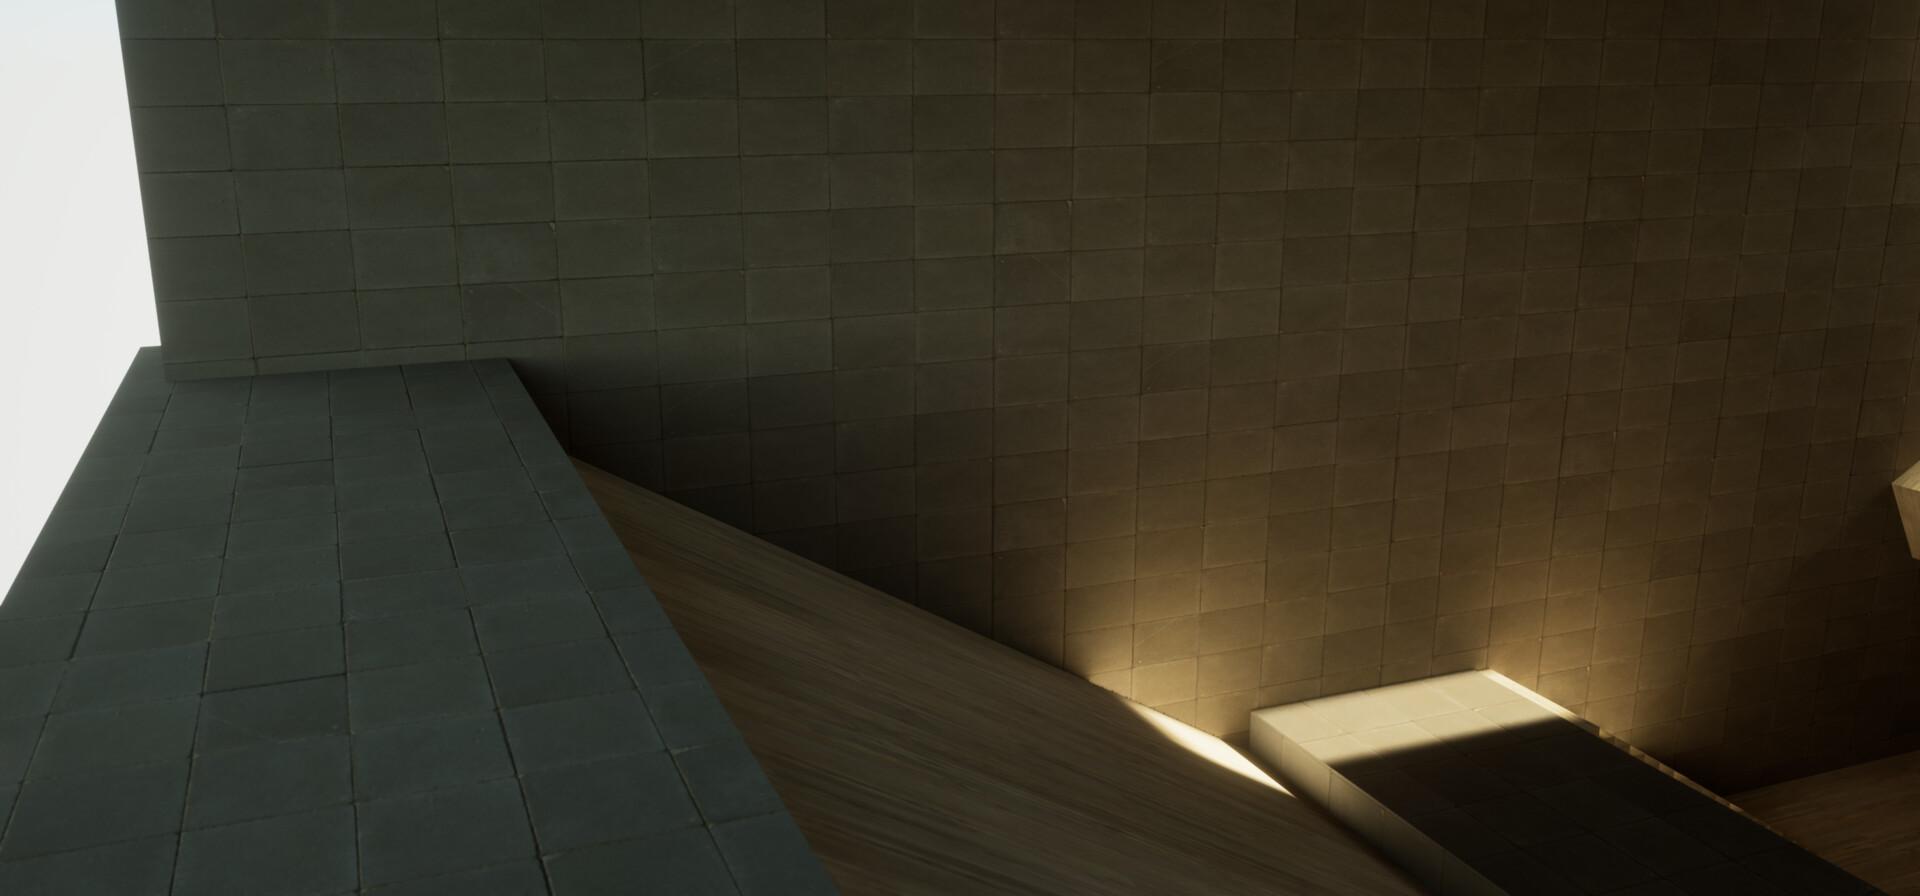 ArtStation - Peter Tran - 01190505 - UE4 lighting study